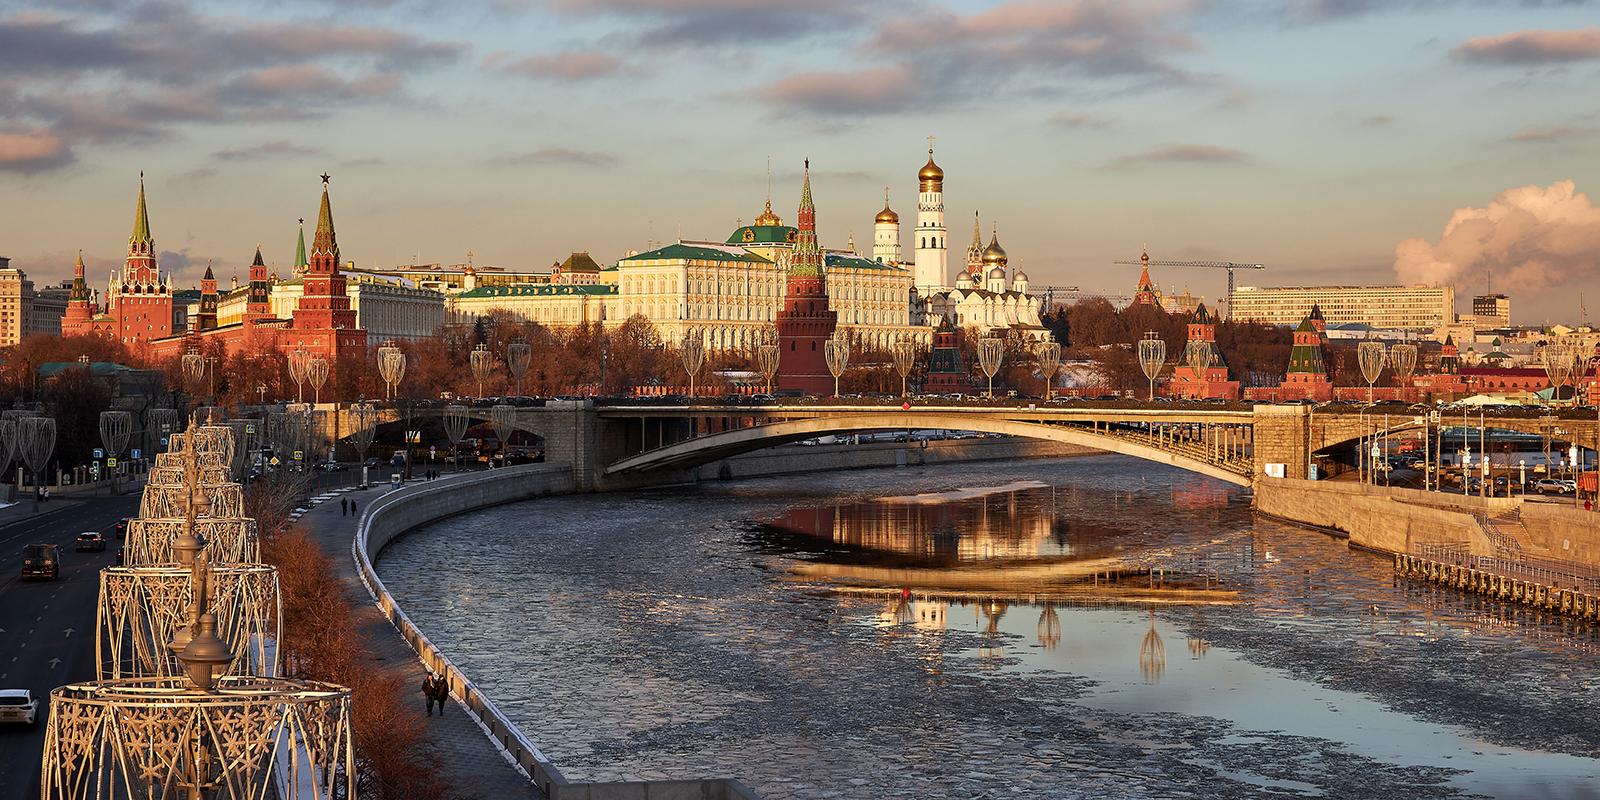 Поддержка МСП: город одобрил субсидии и гранты почти на три миллиарда рублей